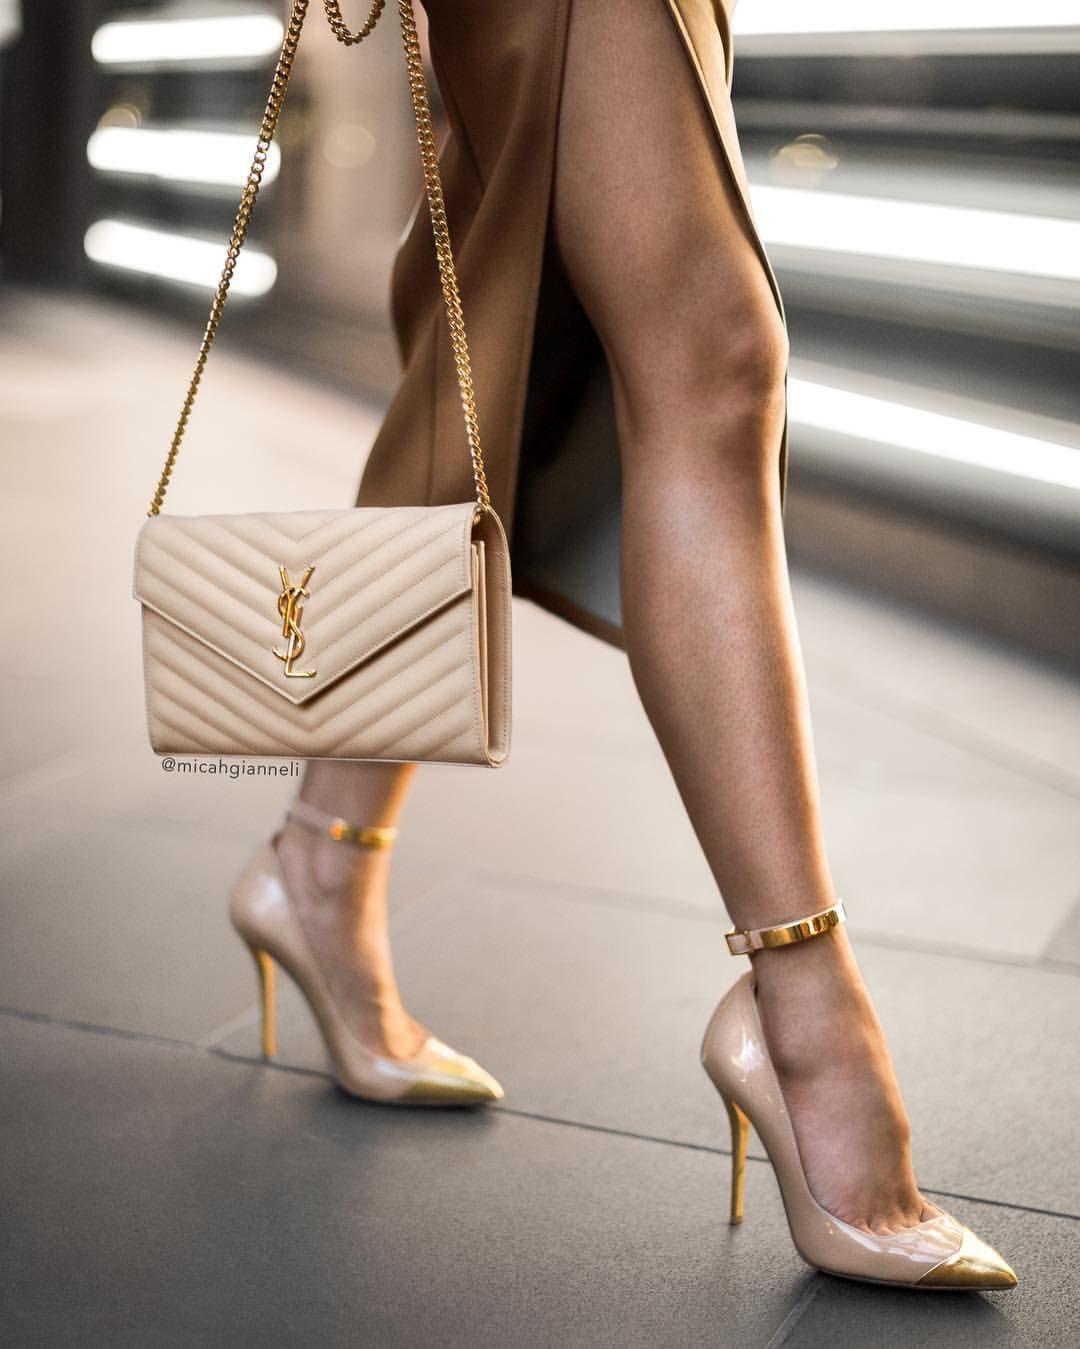 Yves Saint Laurent, Fashion accessory